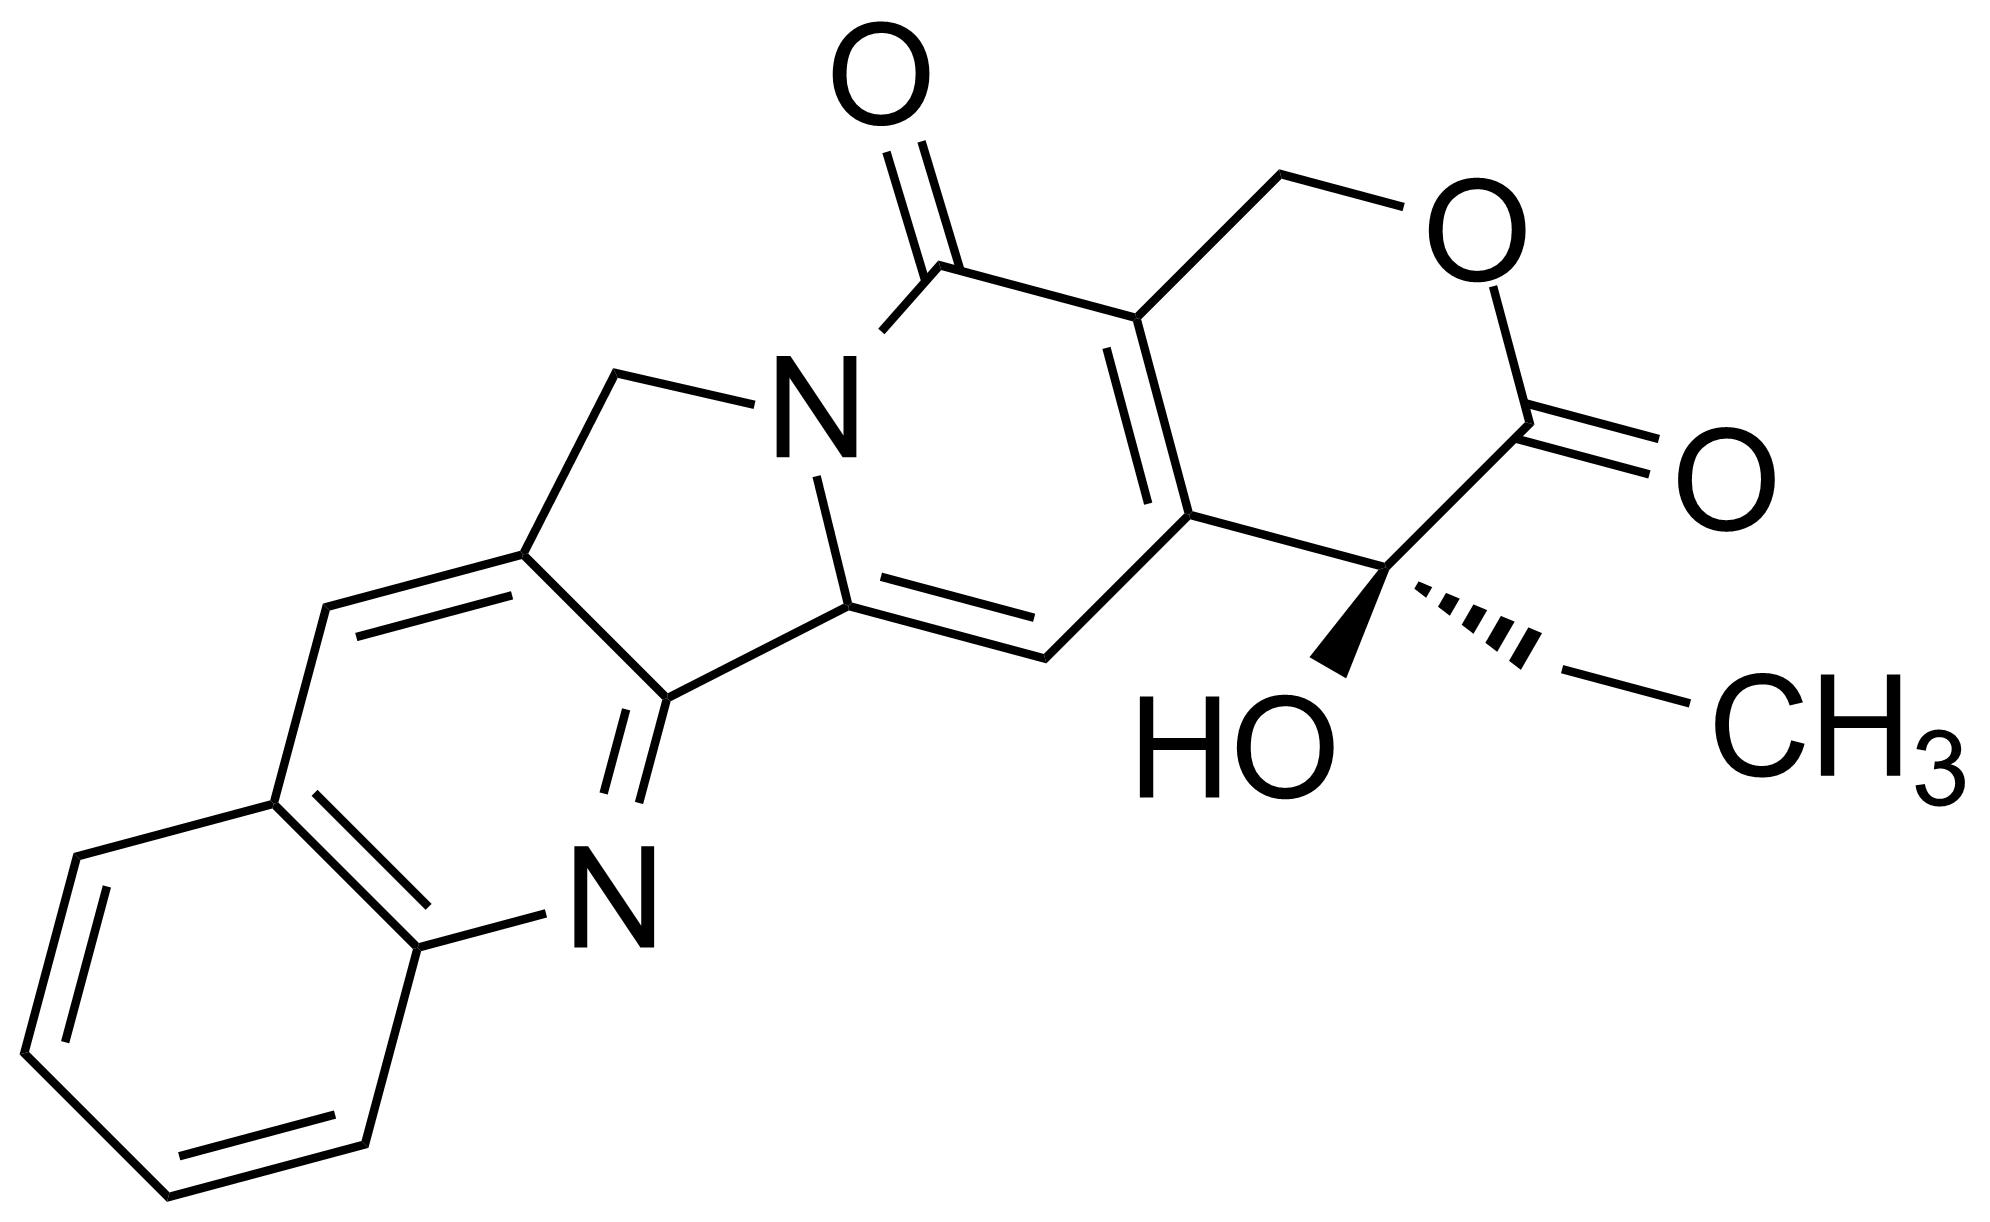 Structure of (+)-Camptothecin